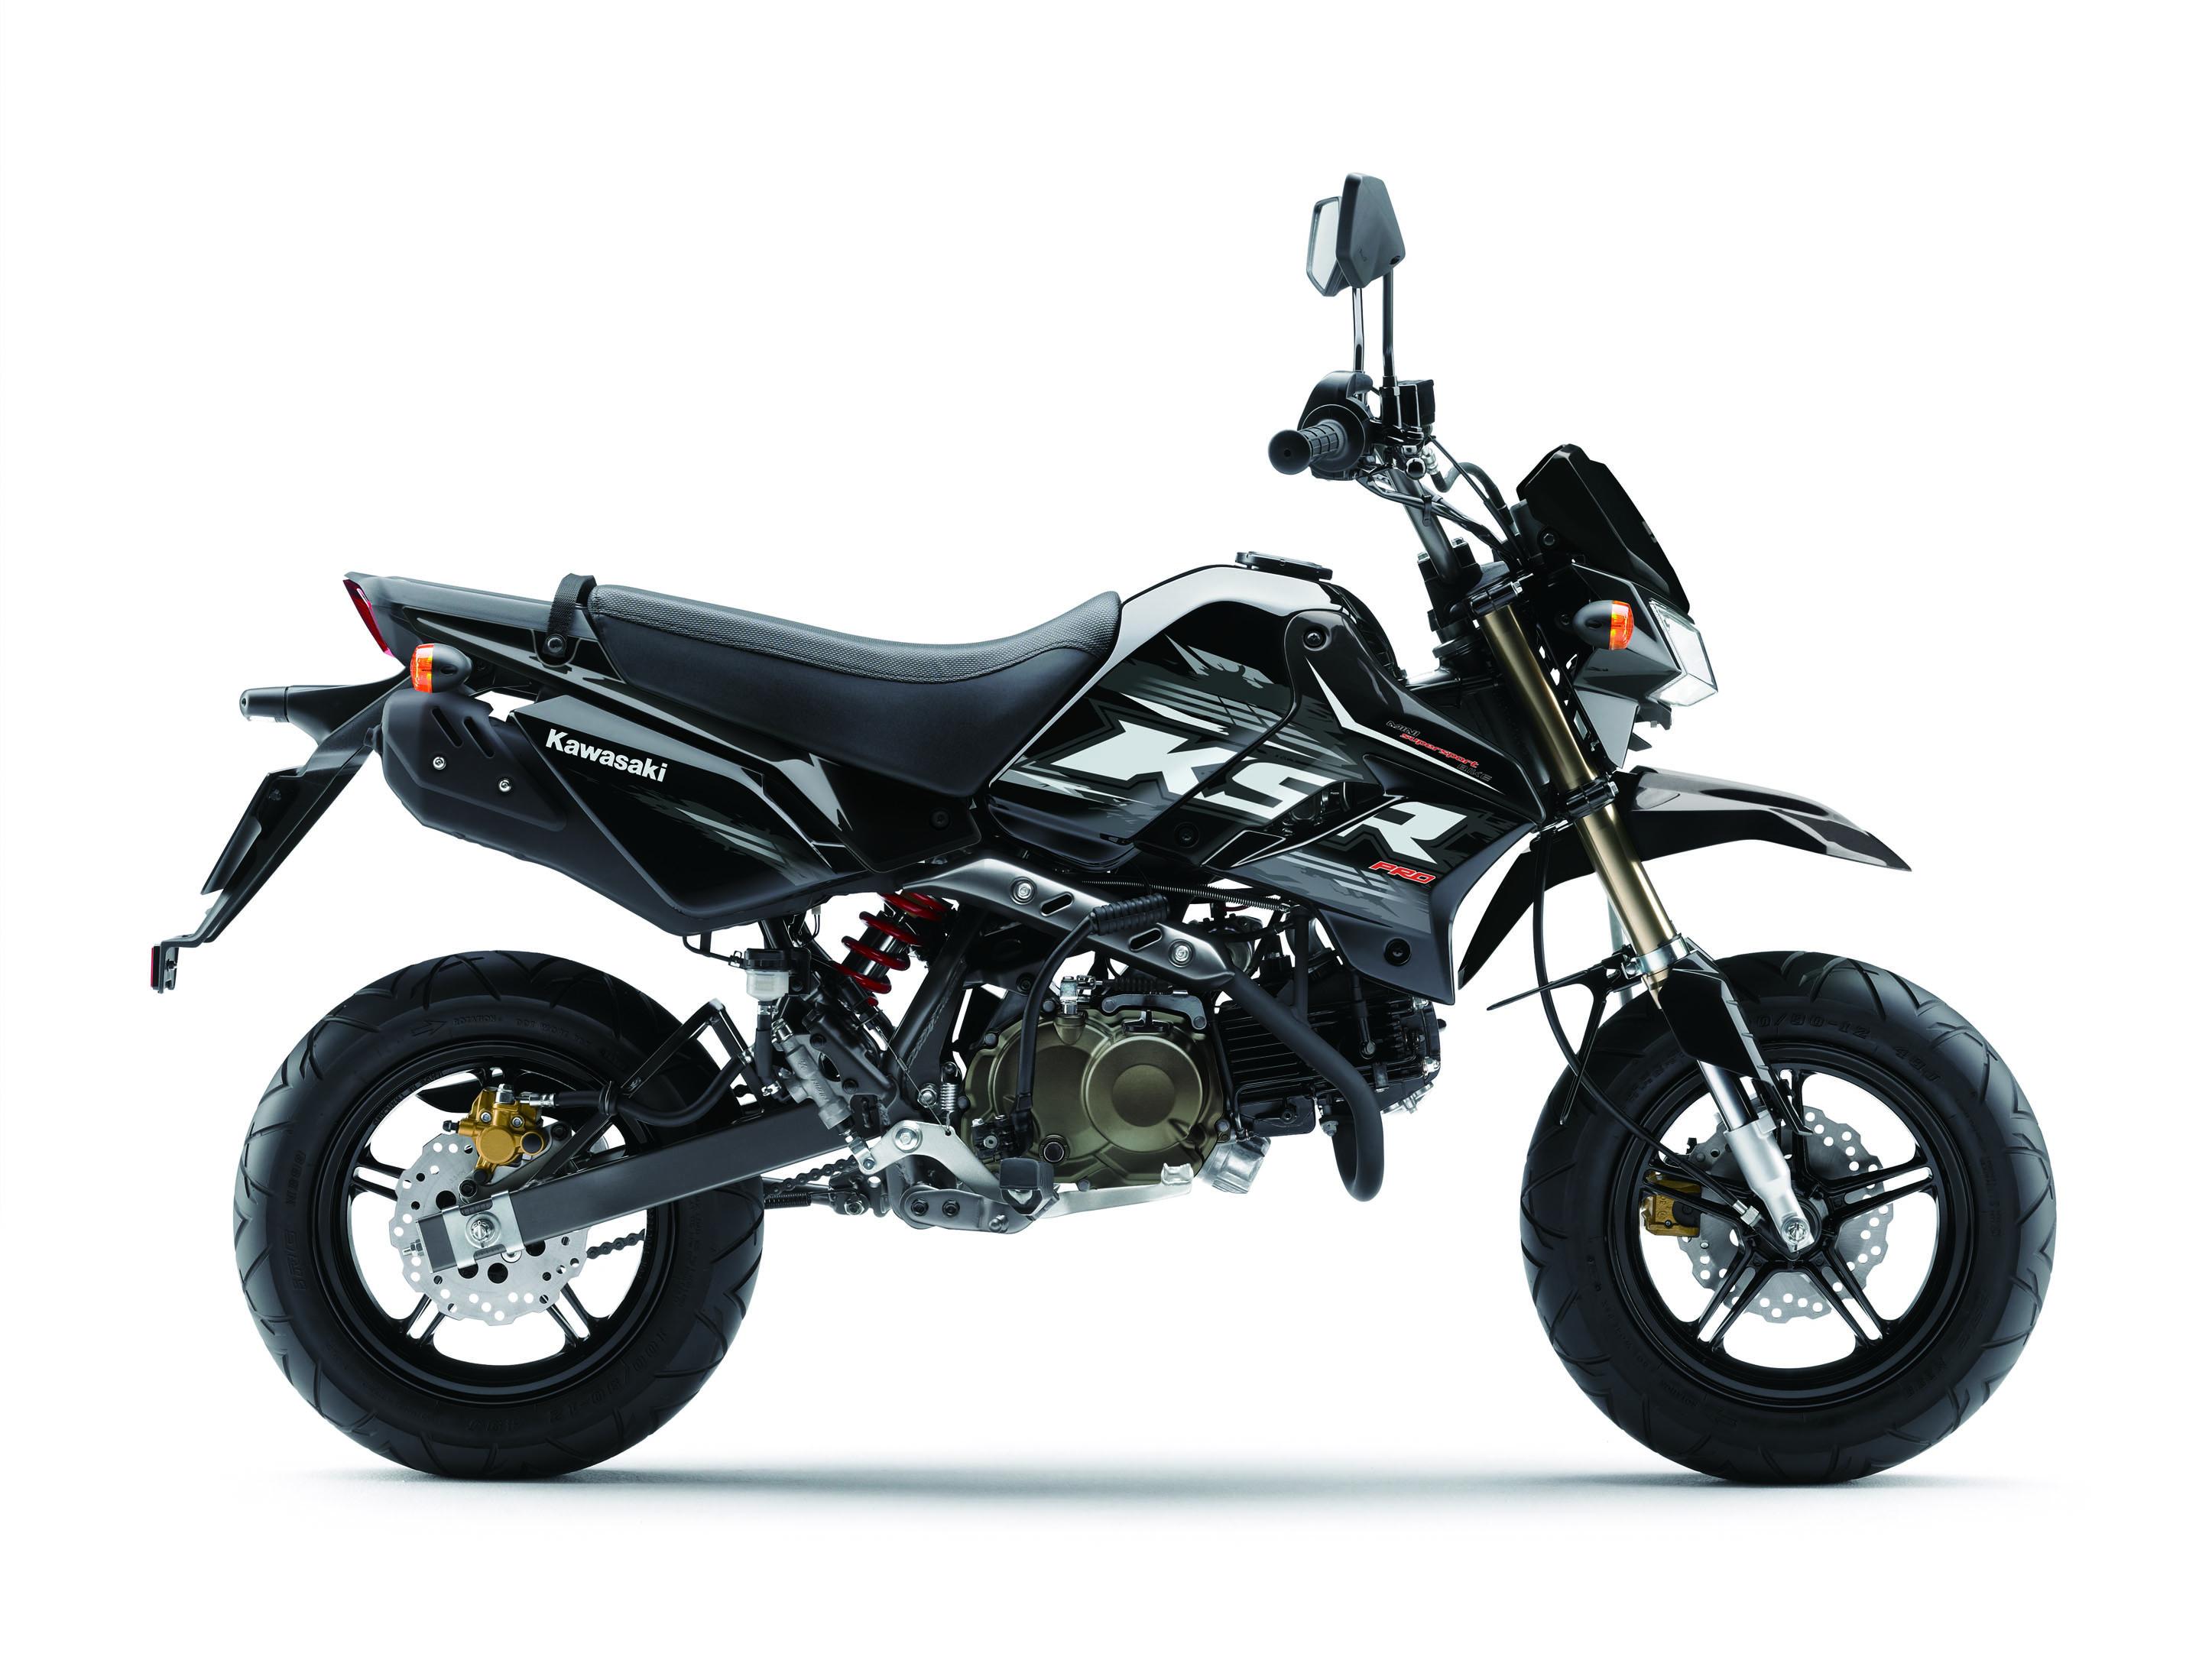 KSR Pro | Kawasaki